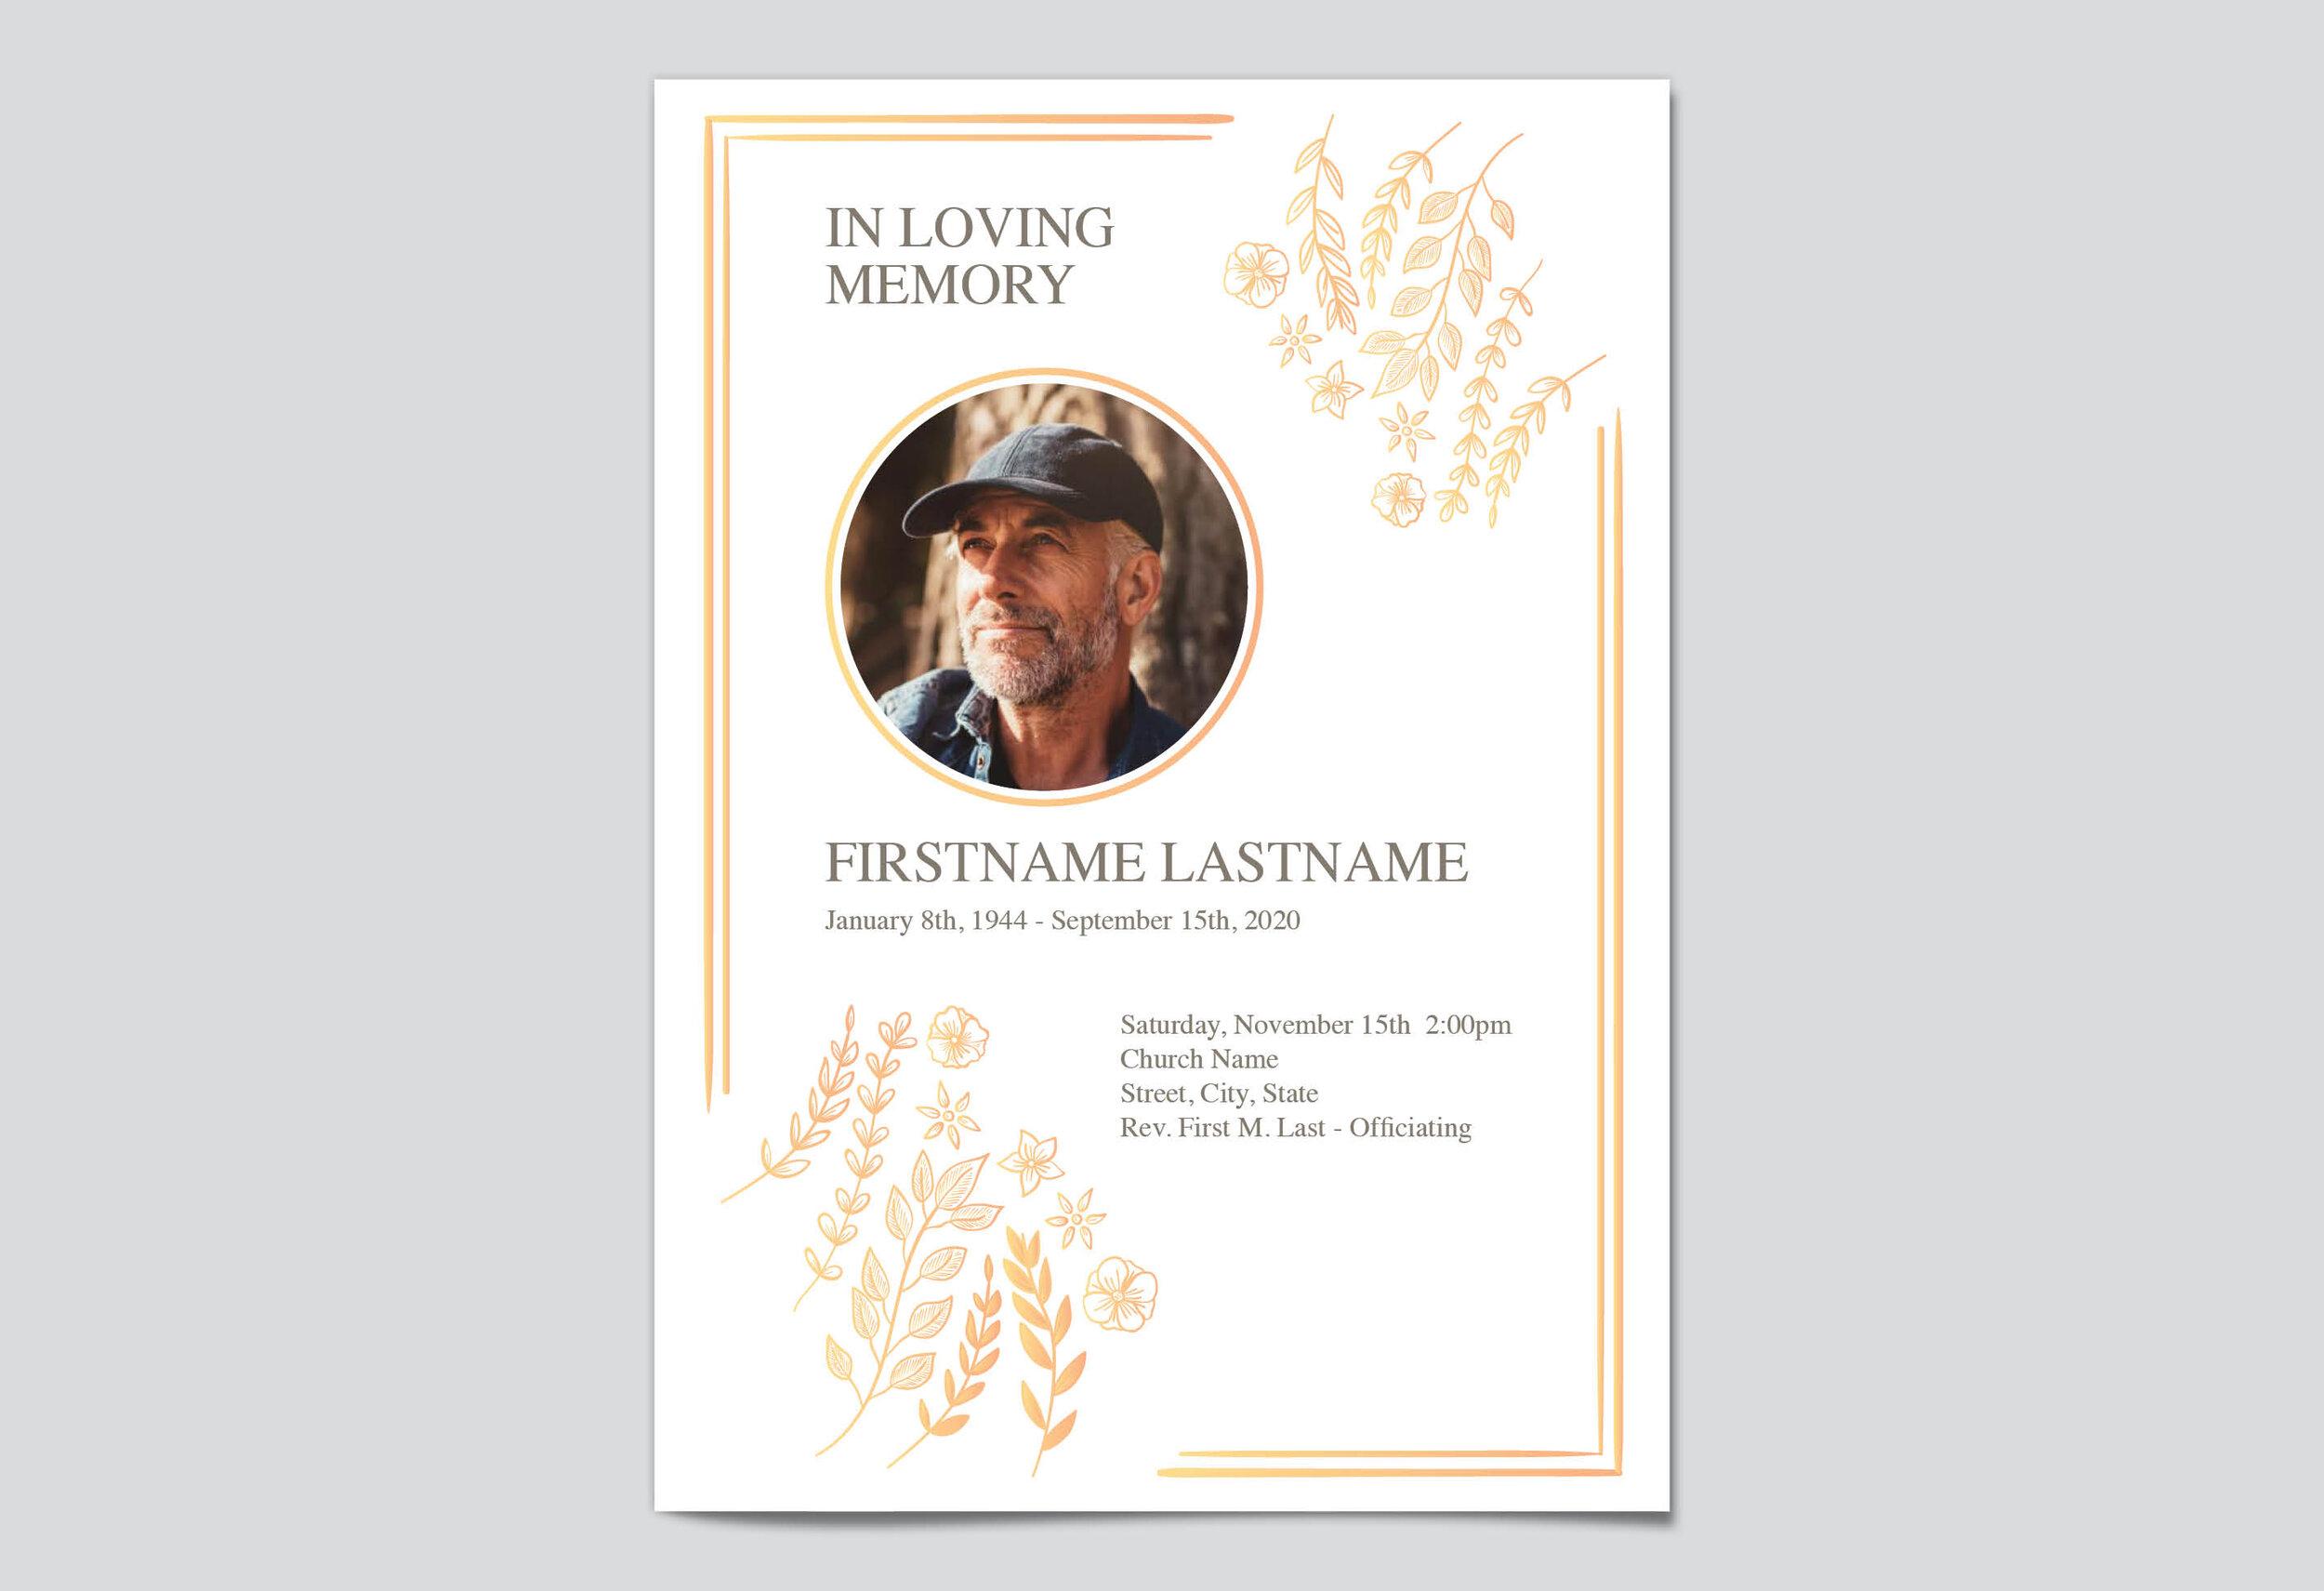 Free Editable Funeral Program Templates  My Wonderful Life Throughout Memorial Card Template Word